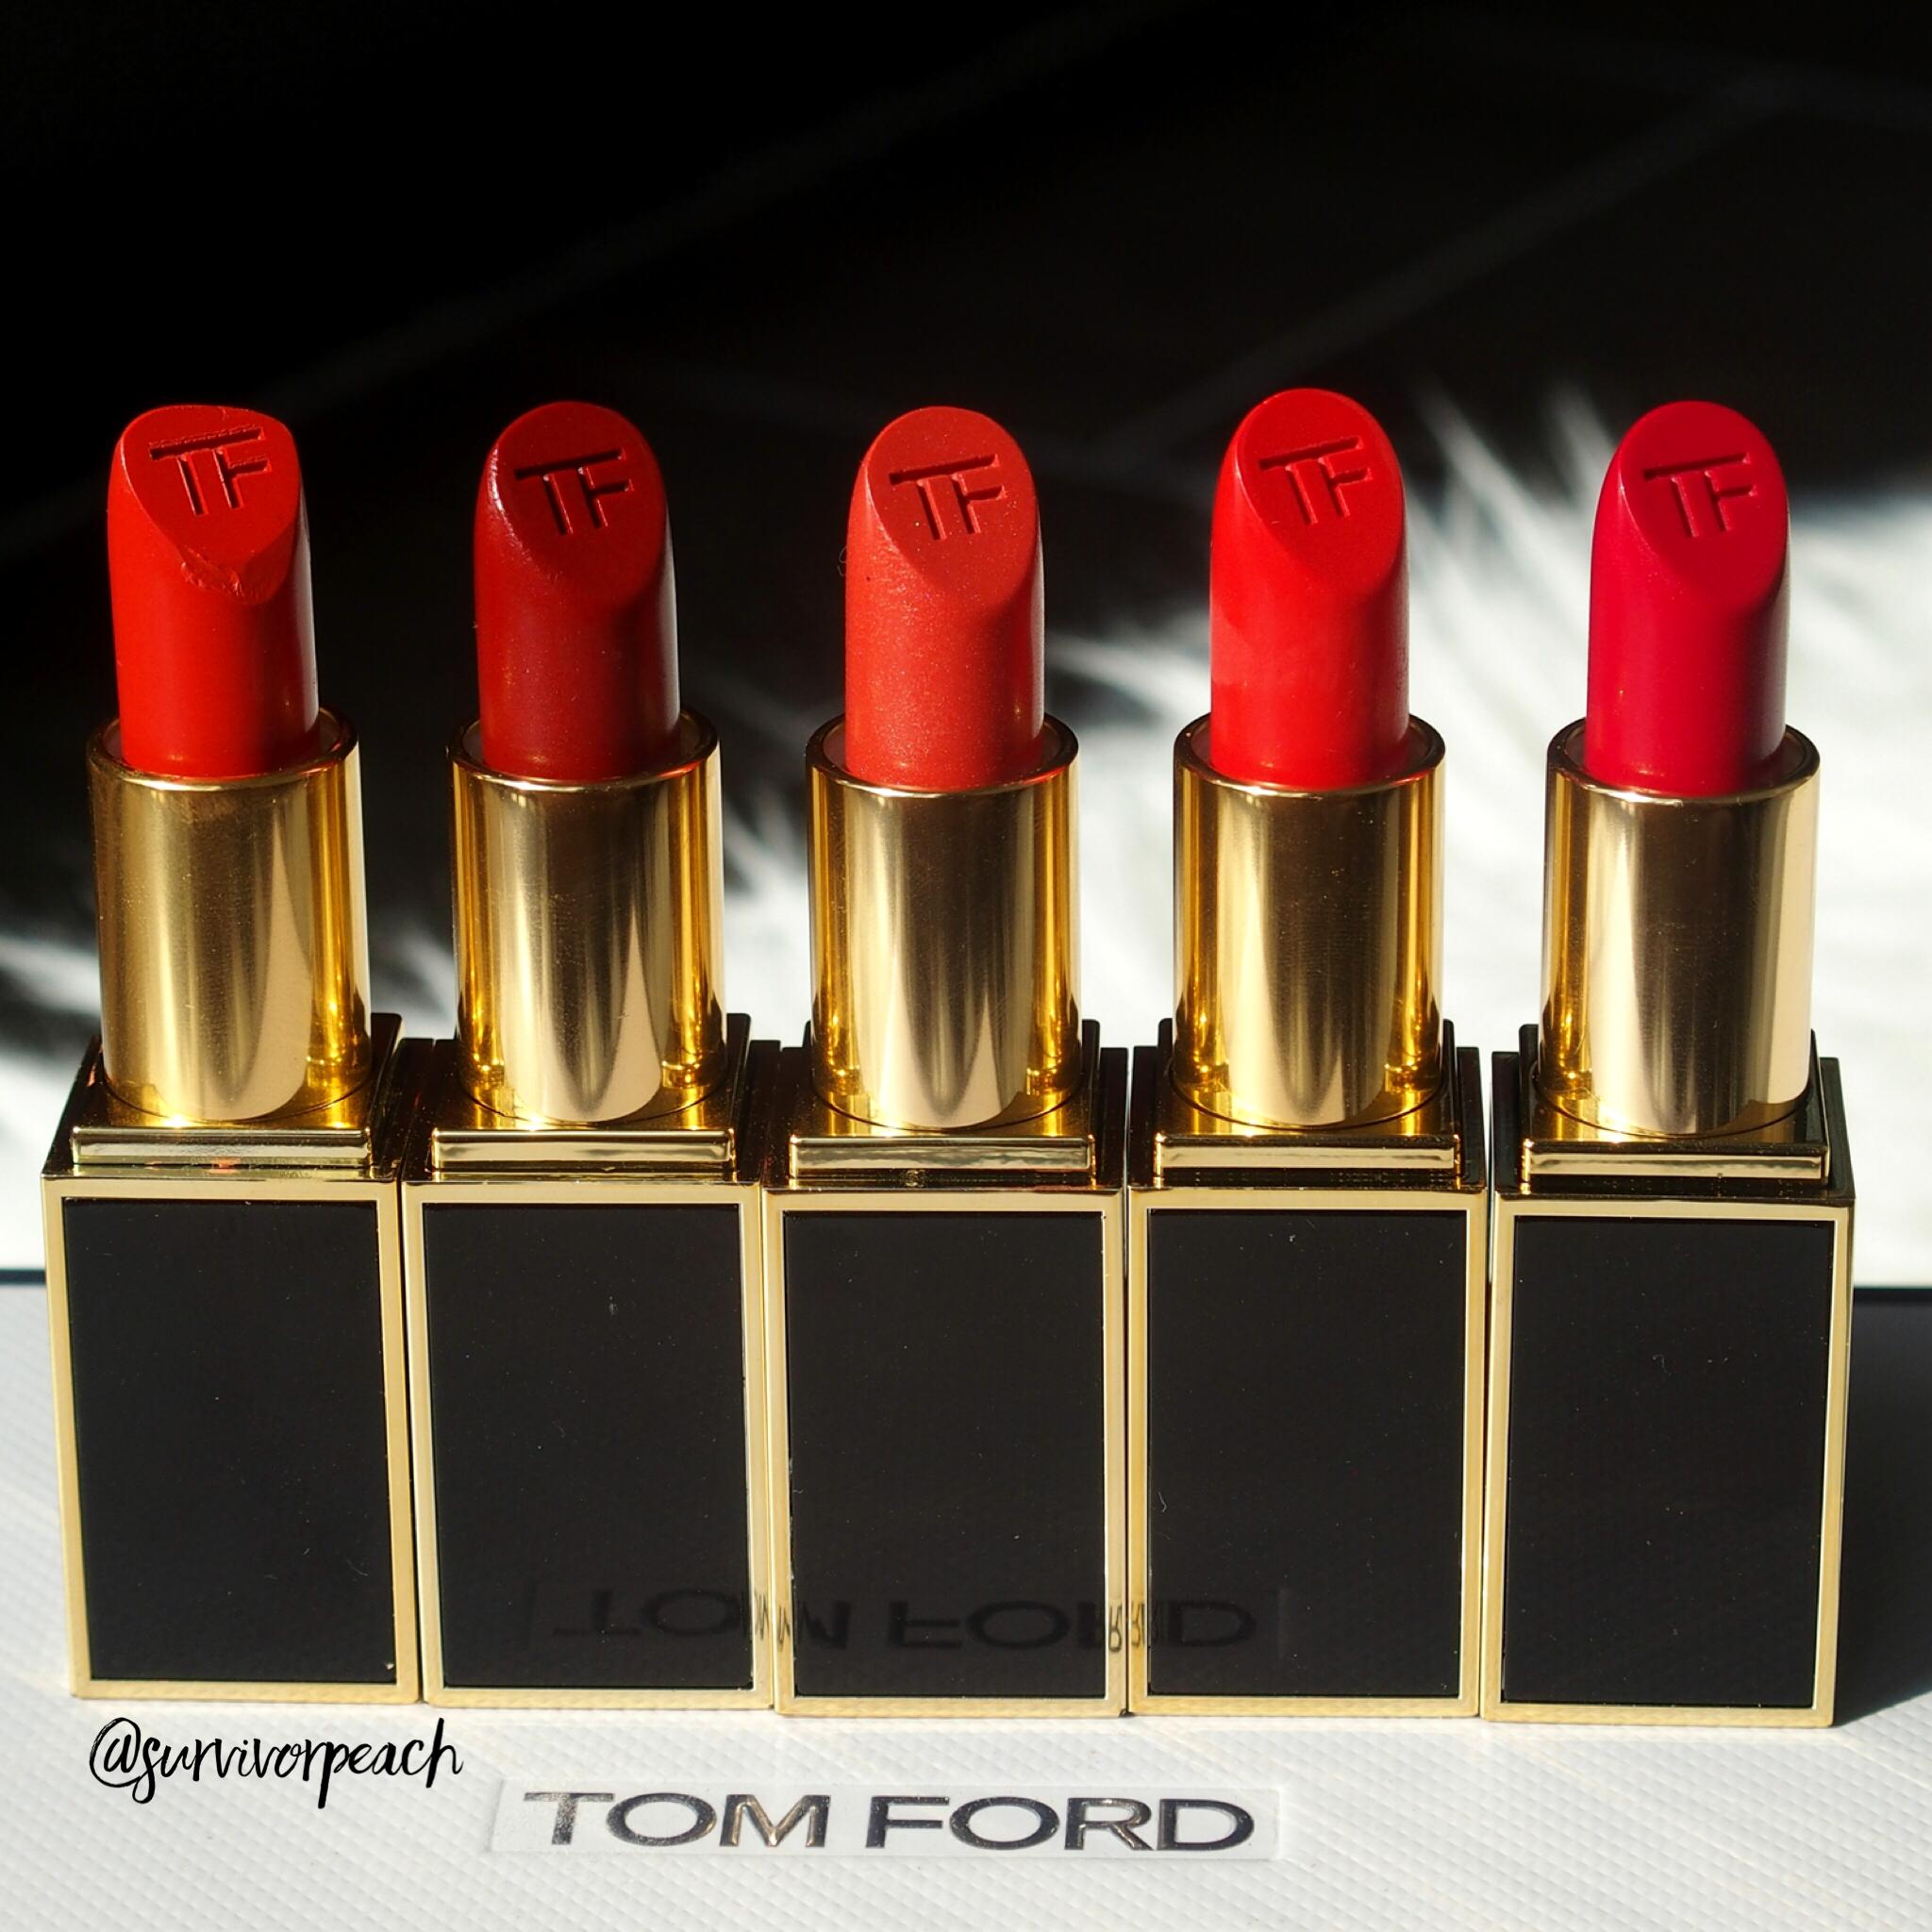 Tom Ford Lipsticks in Wild Ginger, Scarlet Rouge, Contempt, Vermillionaire, Jasmin Rouge